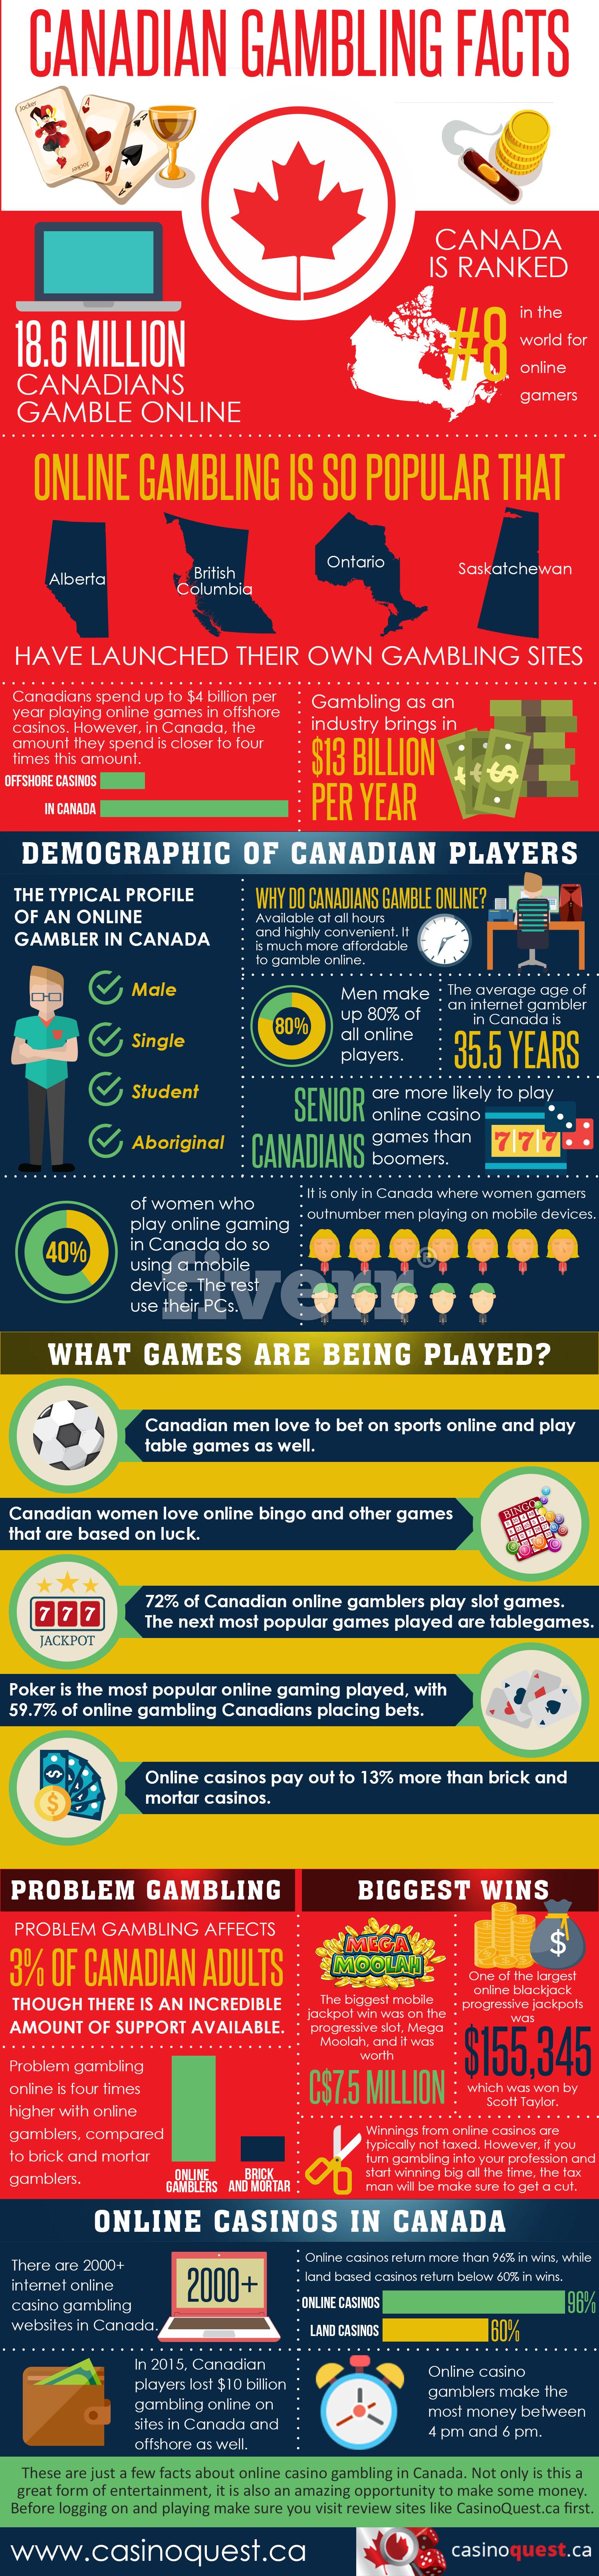 Canada Gambling Info graphic